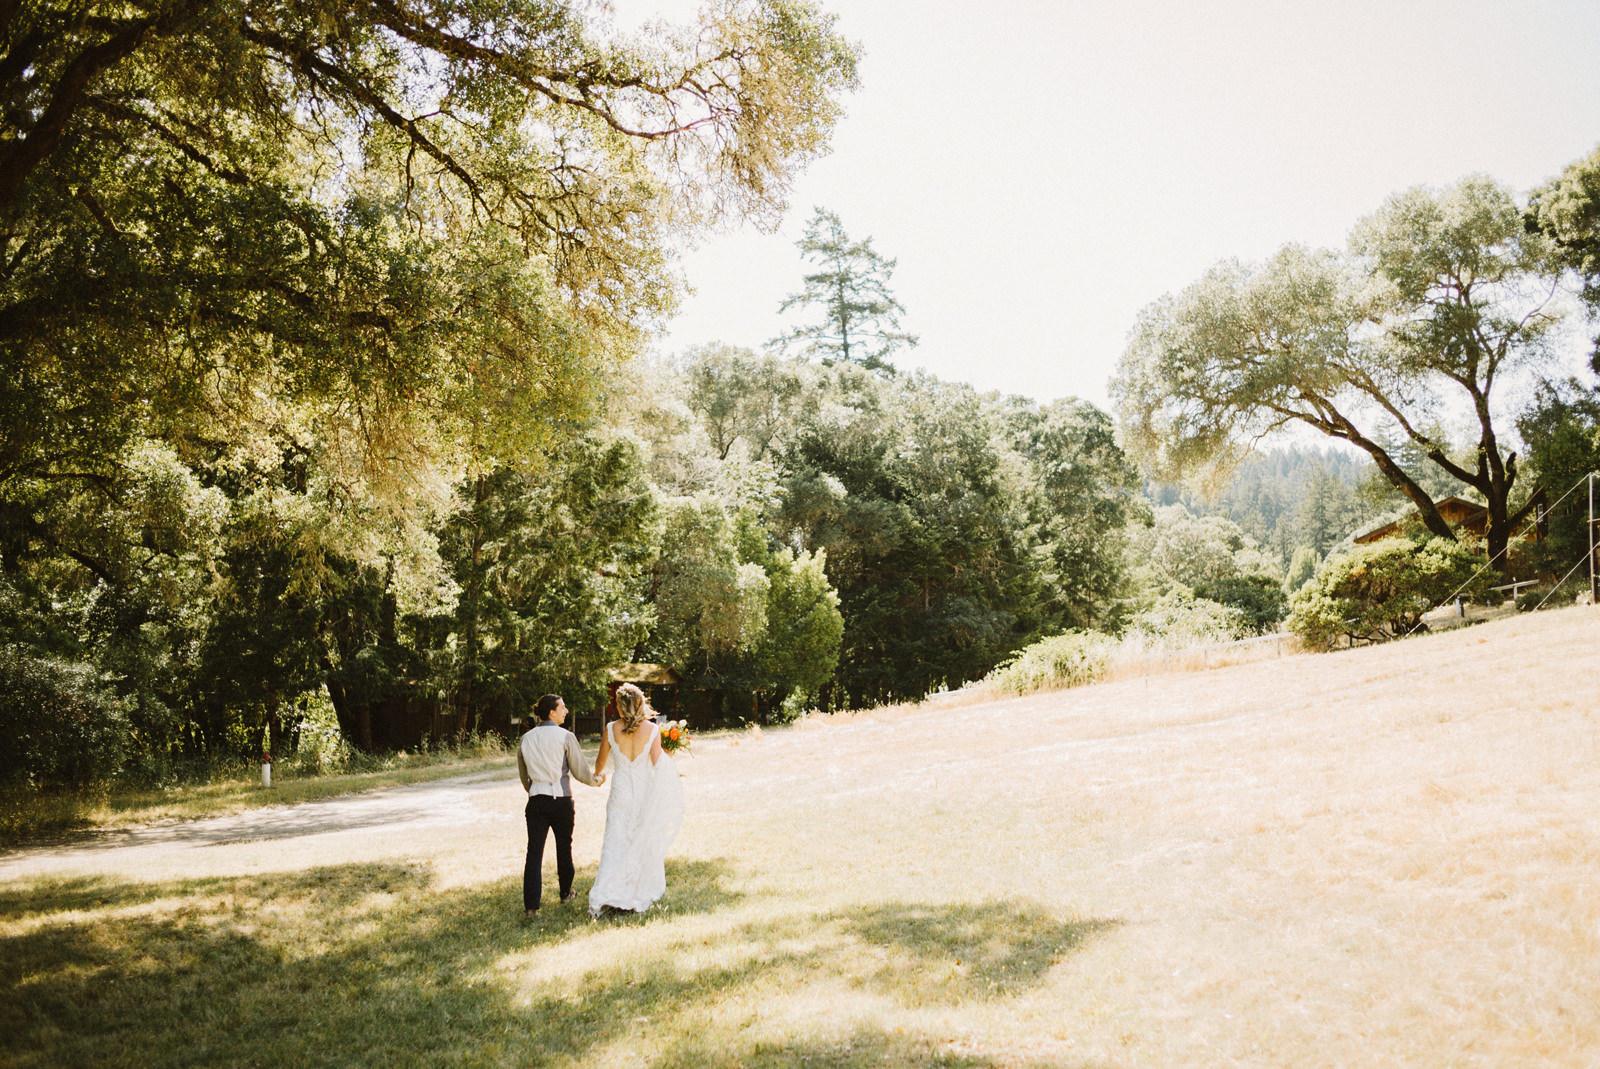 rivers-bend-retreat-wedding-041 RIVER'S BEND RETREAT WEDDING